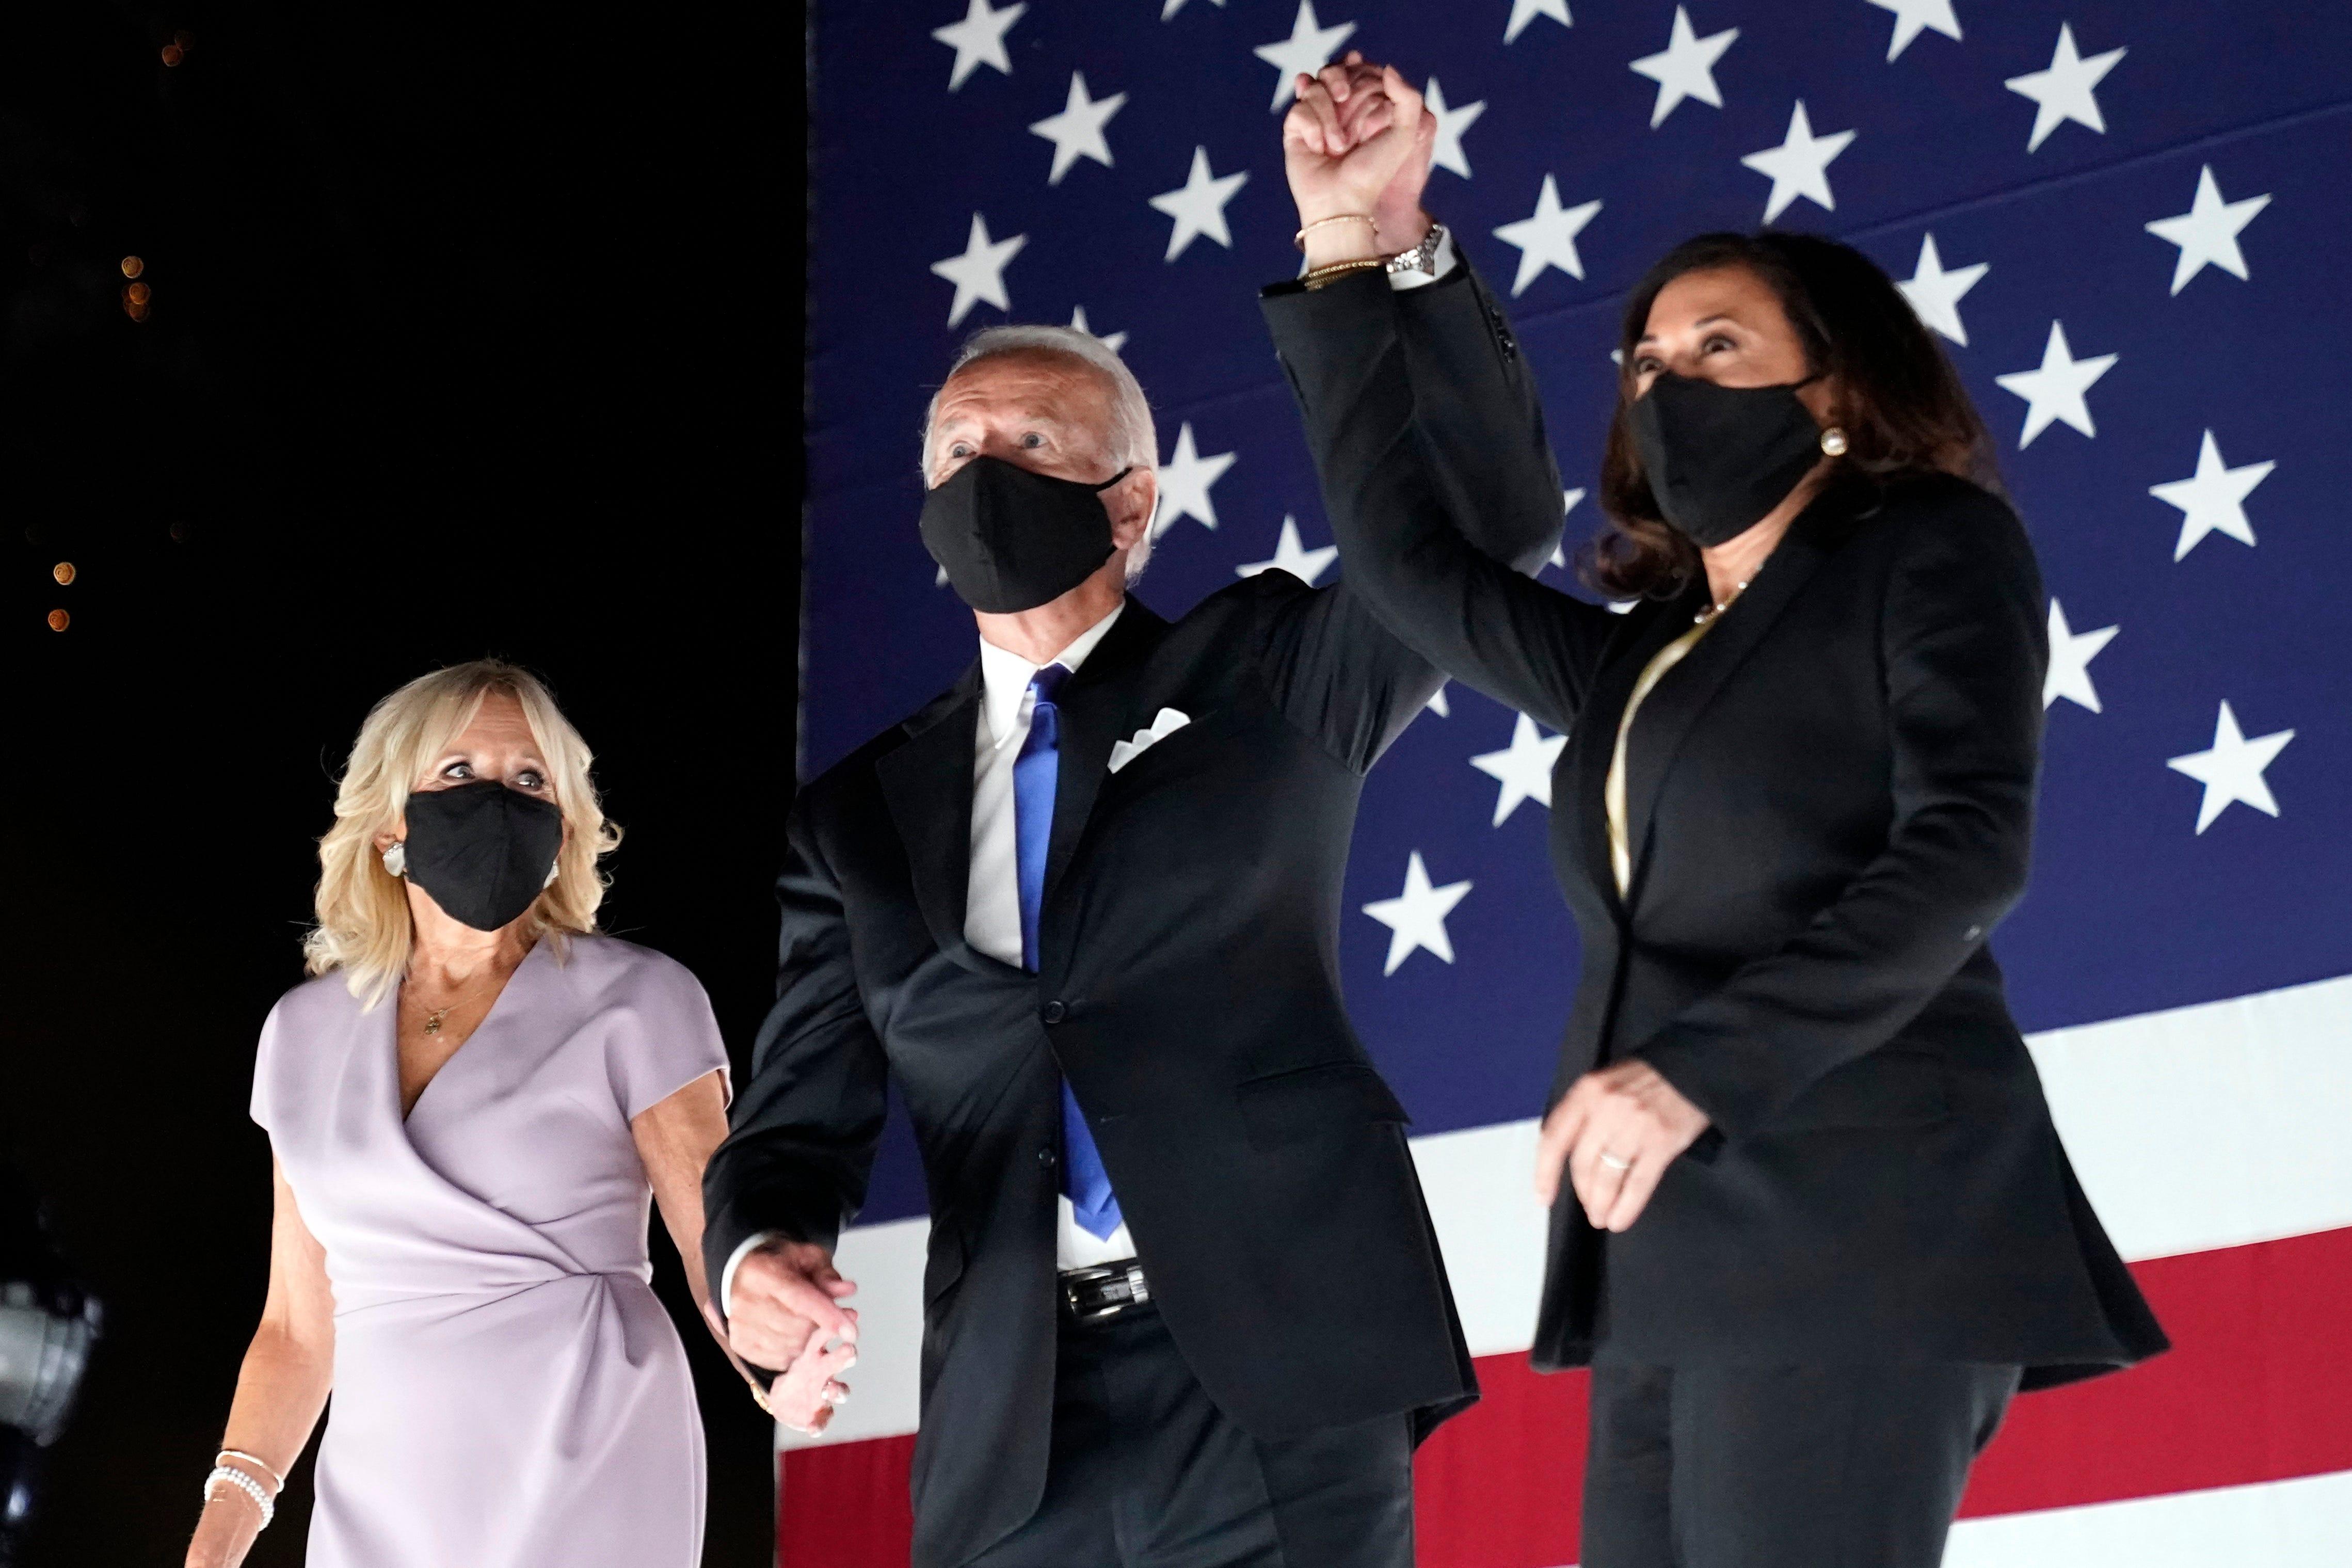 Joe Biden Claims Democratic Nomination During Dnc Speech